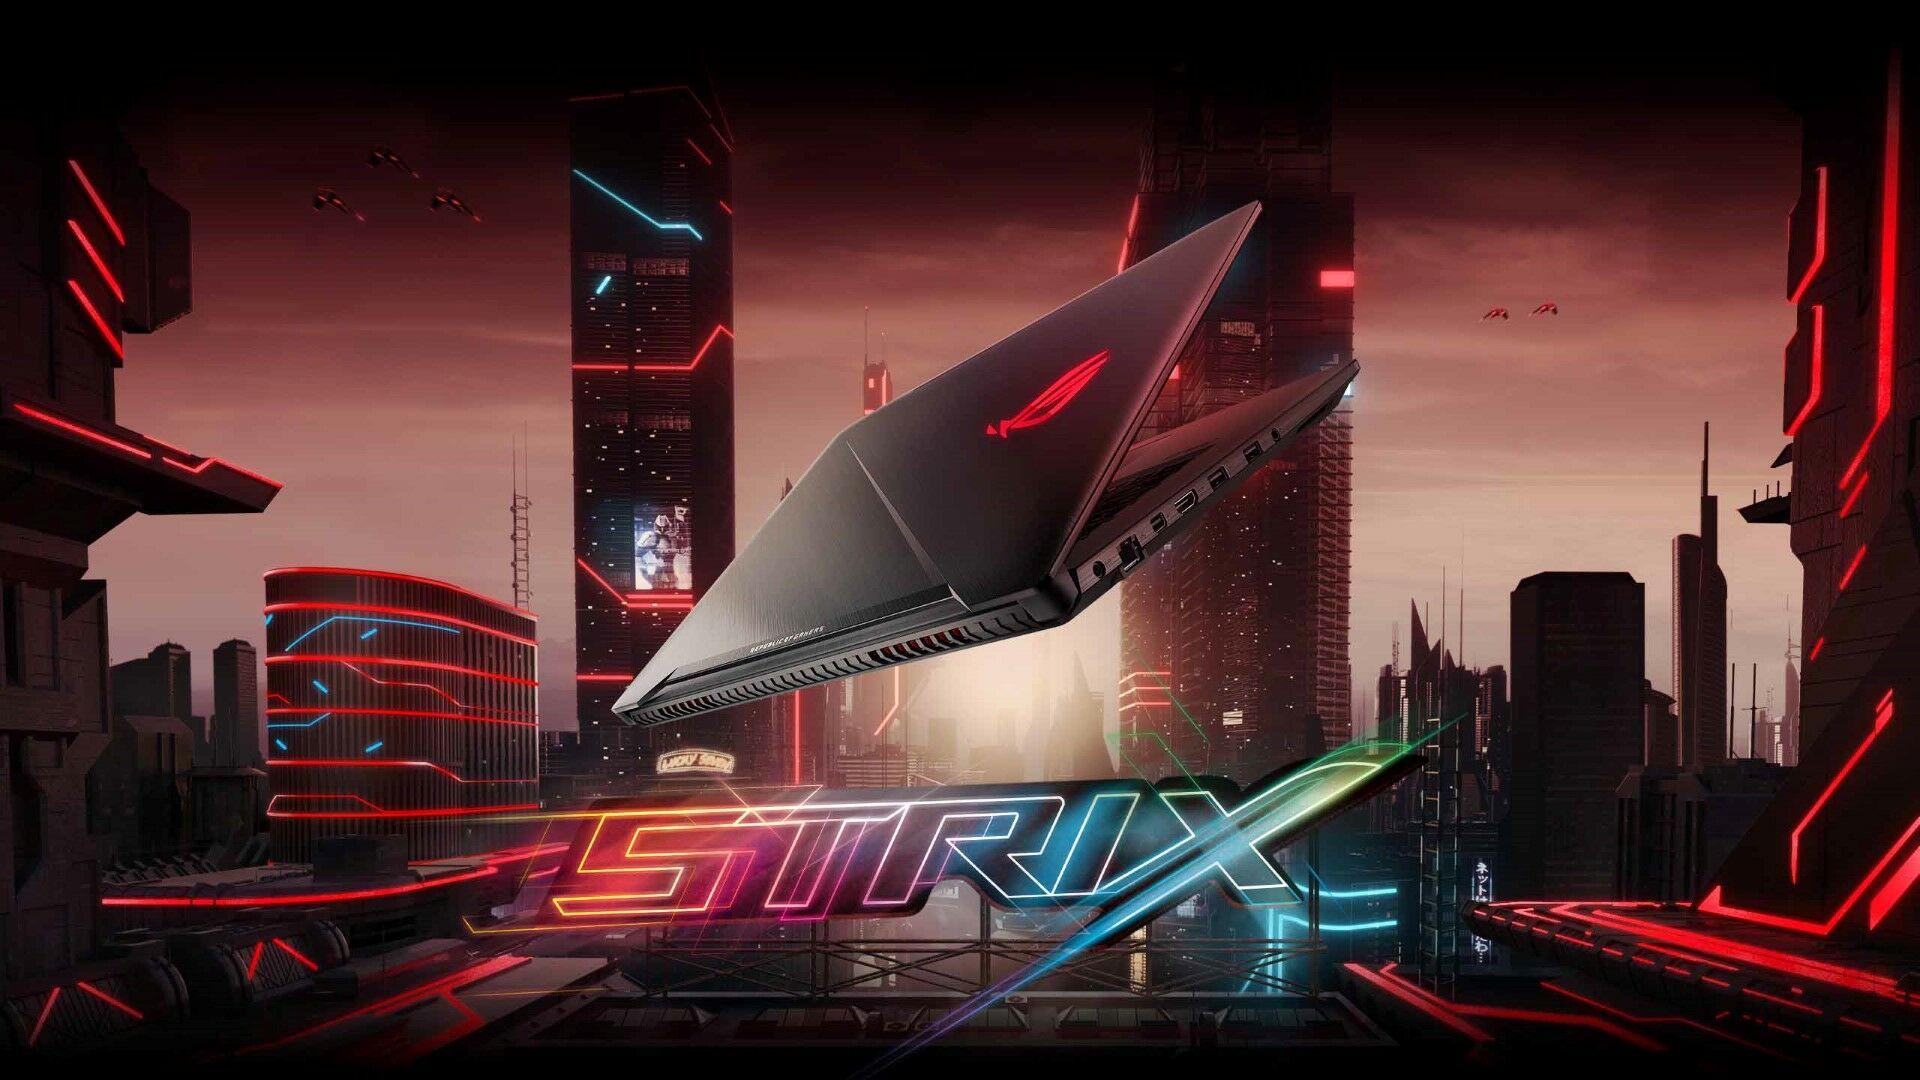 Review Asus Rog Strix Gl503vm Scar Edition 0